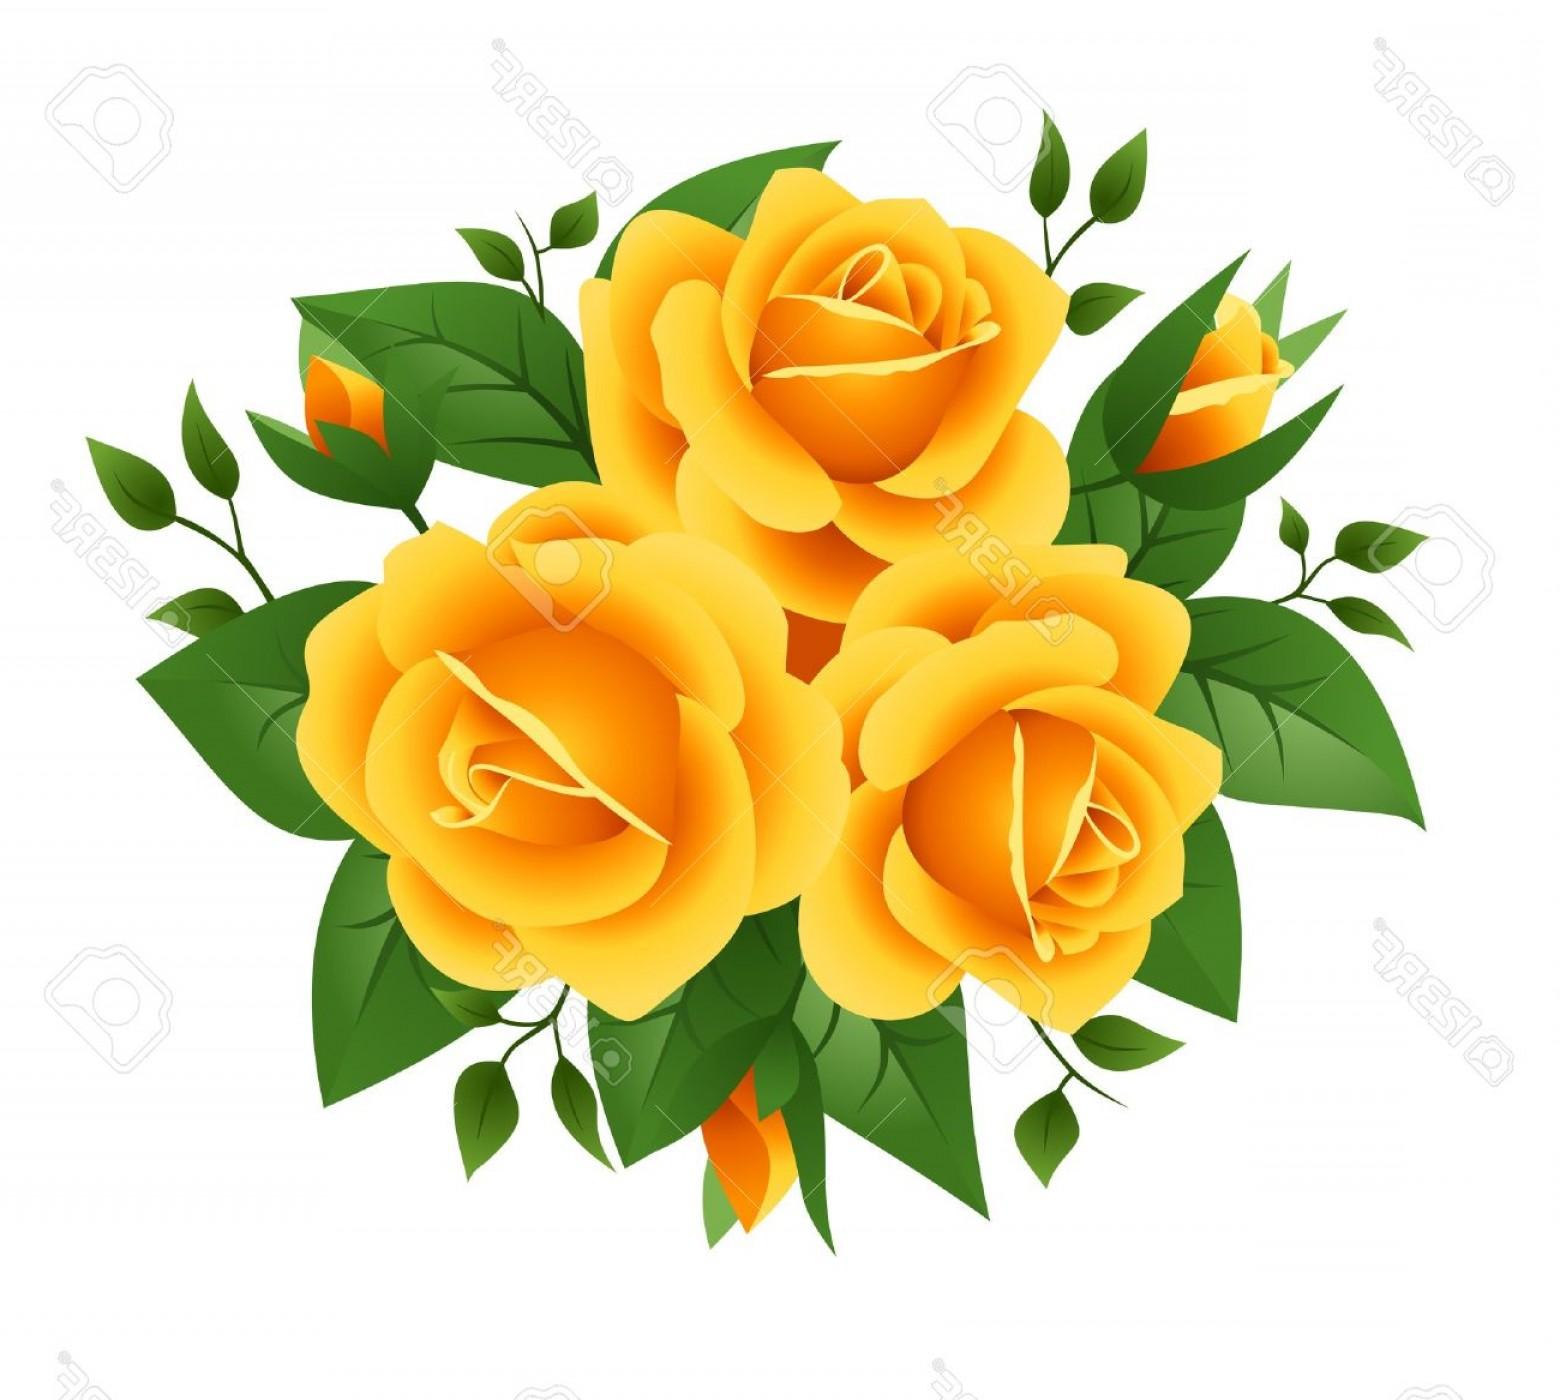 1560x1400 Photothree Yellow Roses Vector Illustration Arenawp